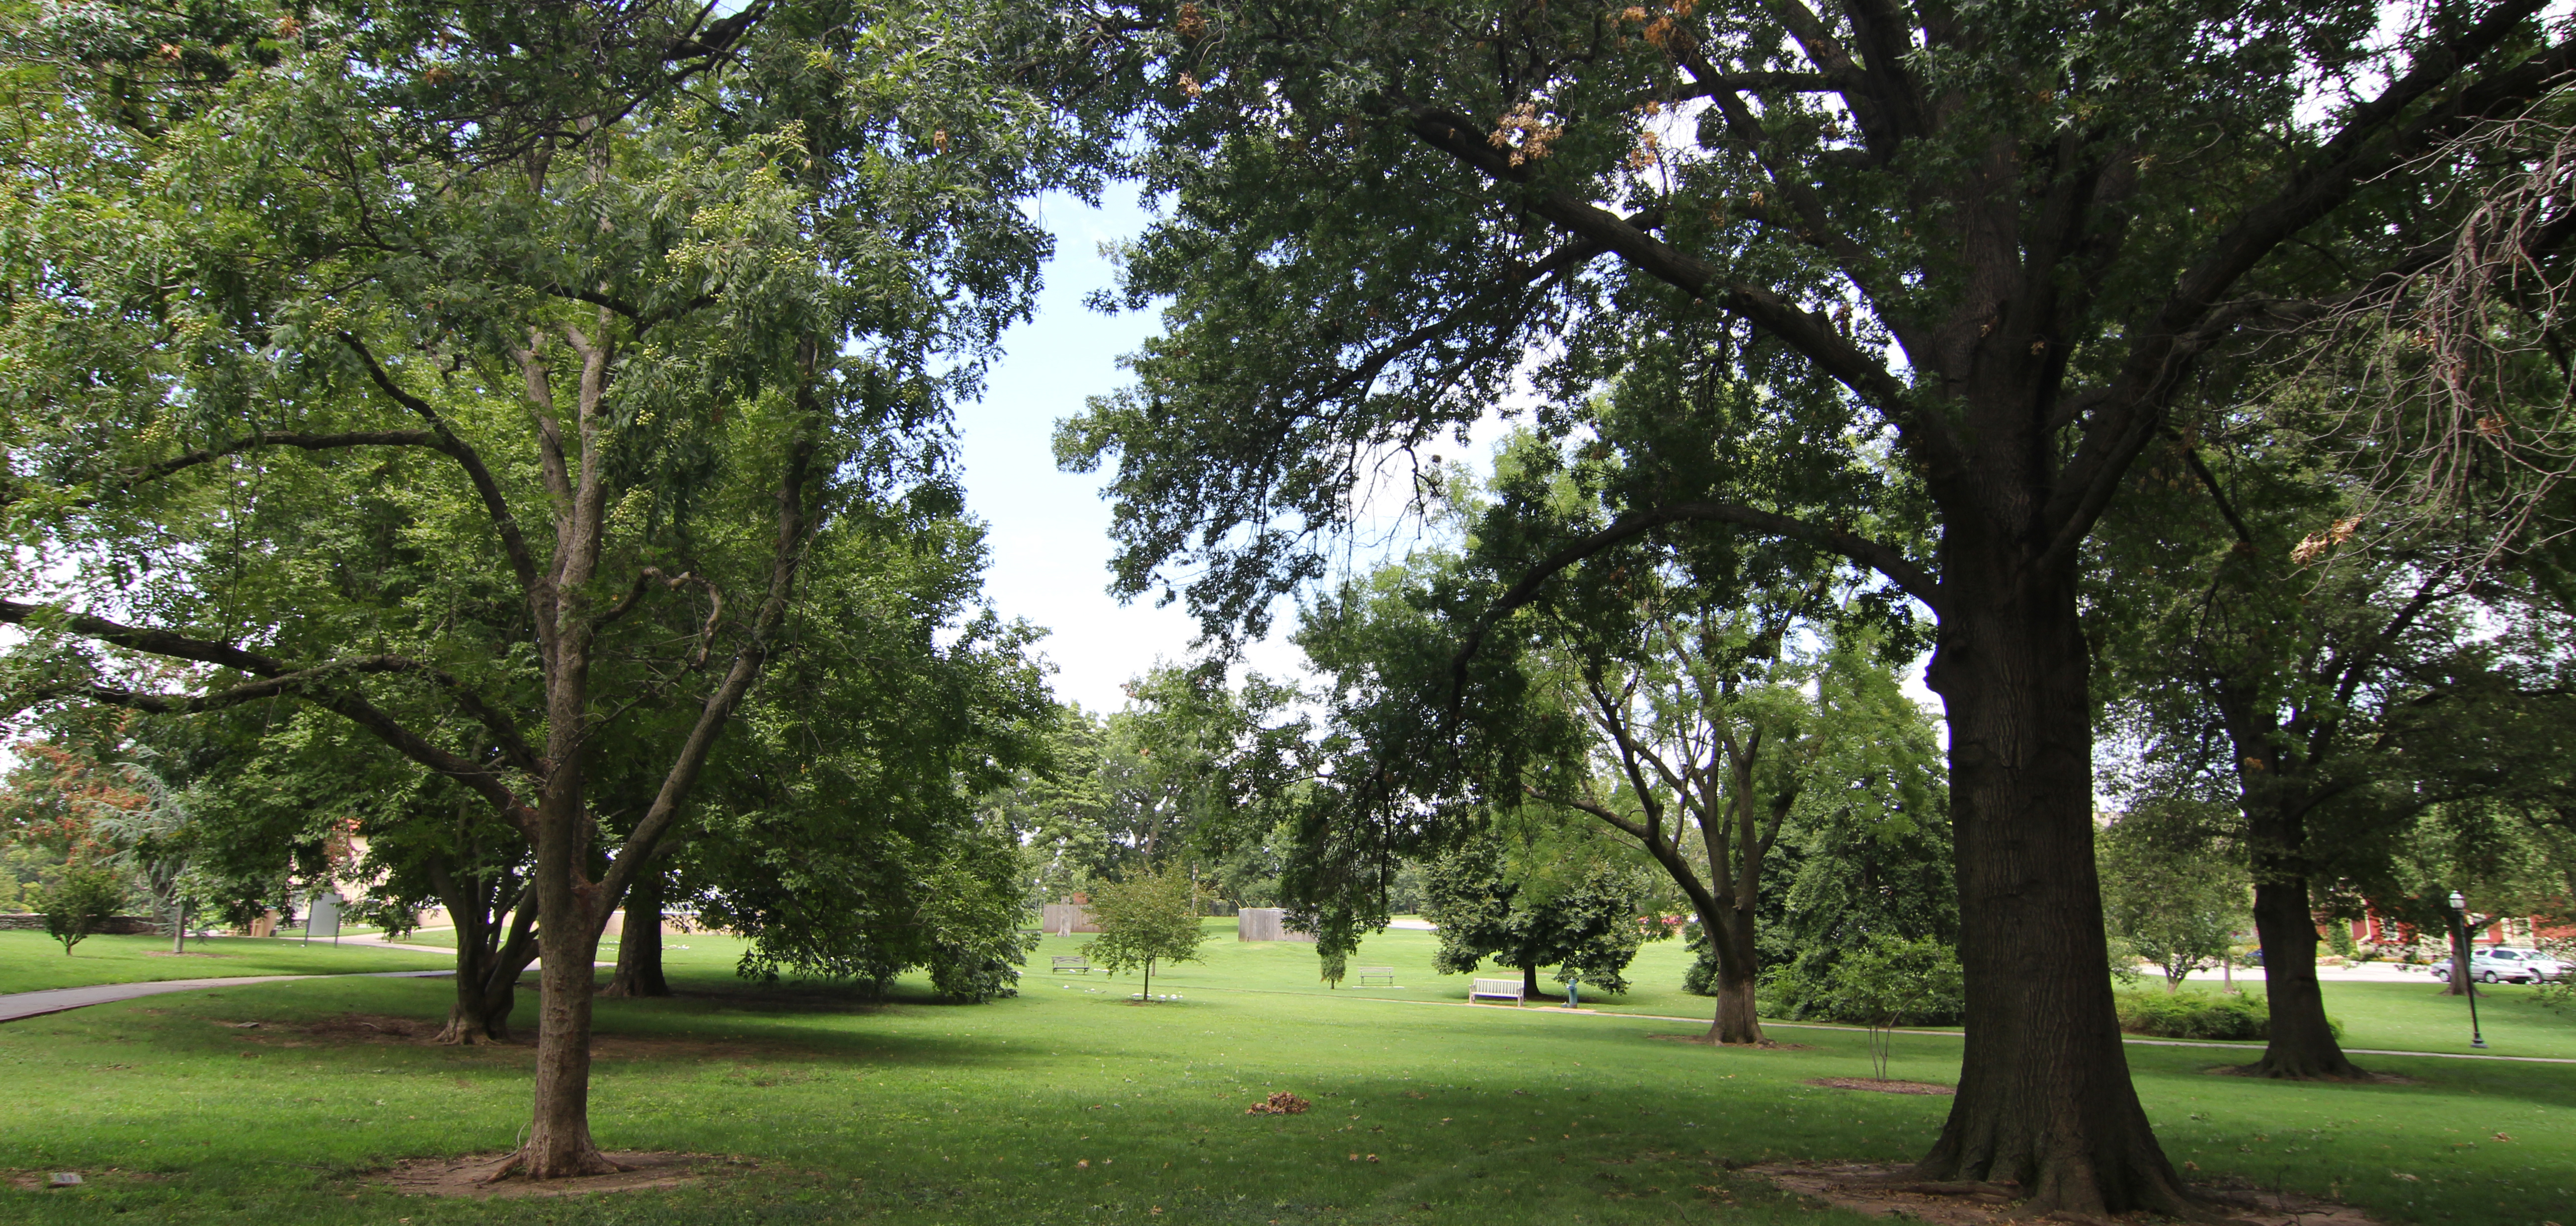 Large trees provide ample shade at Woodward Park.